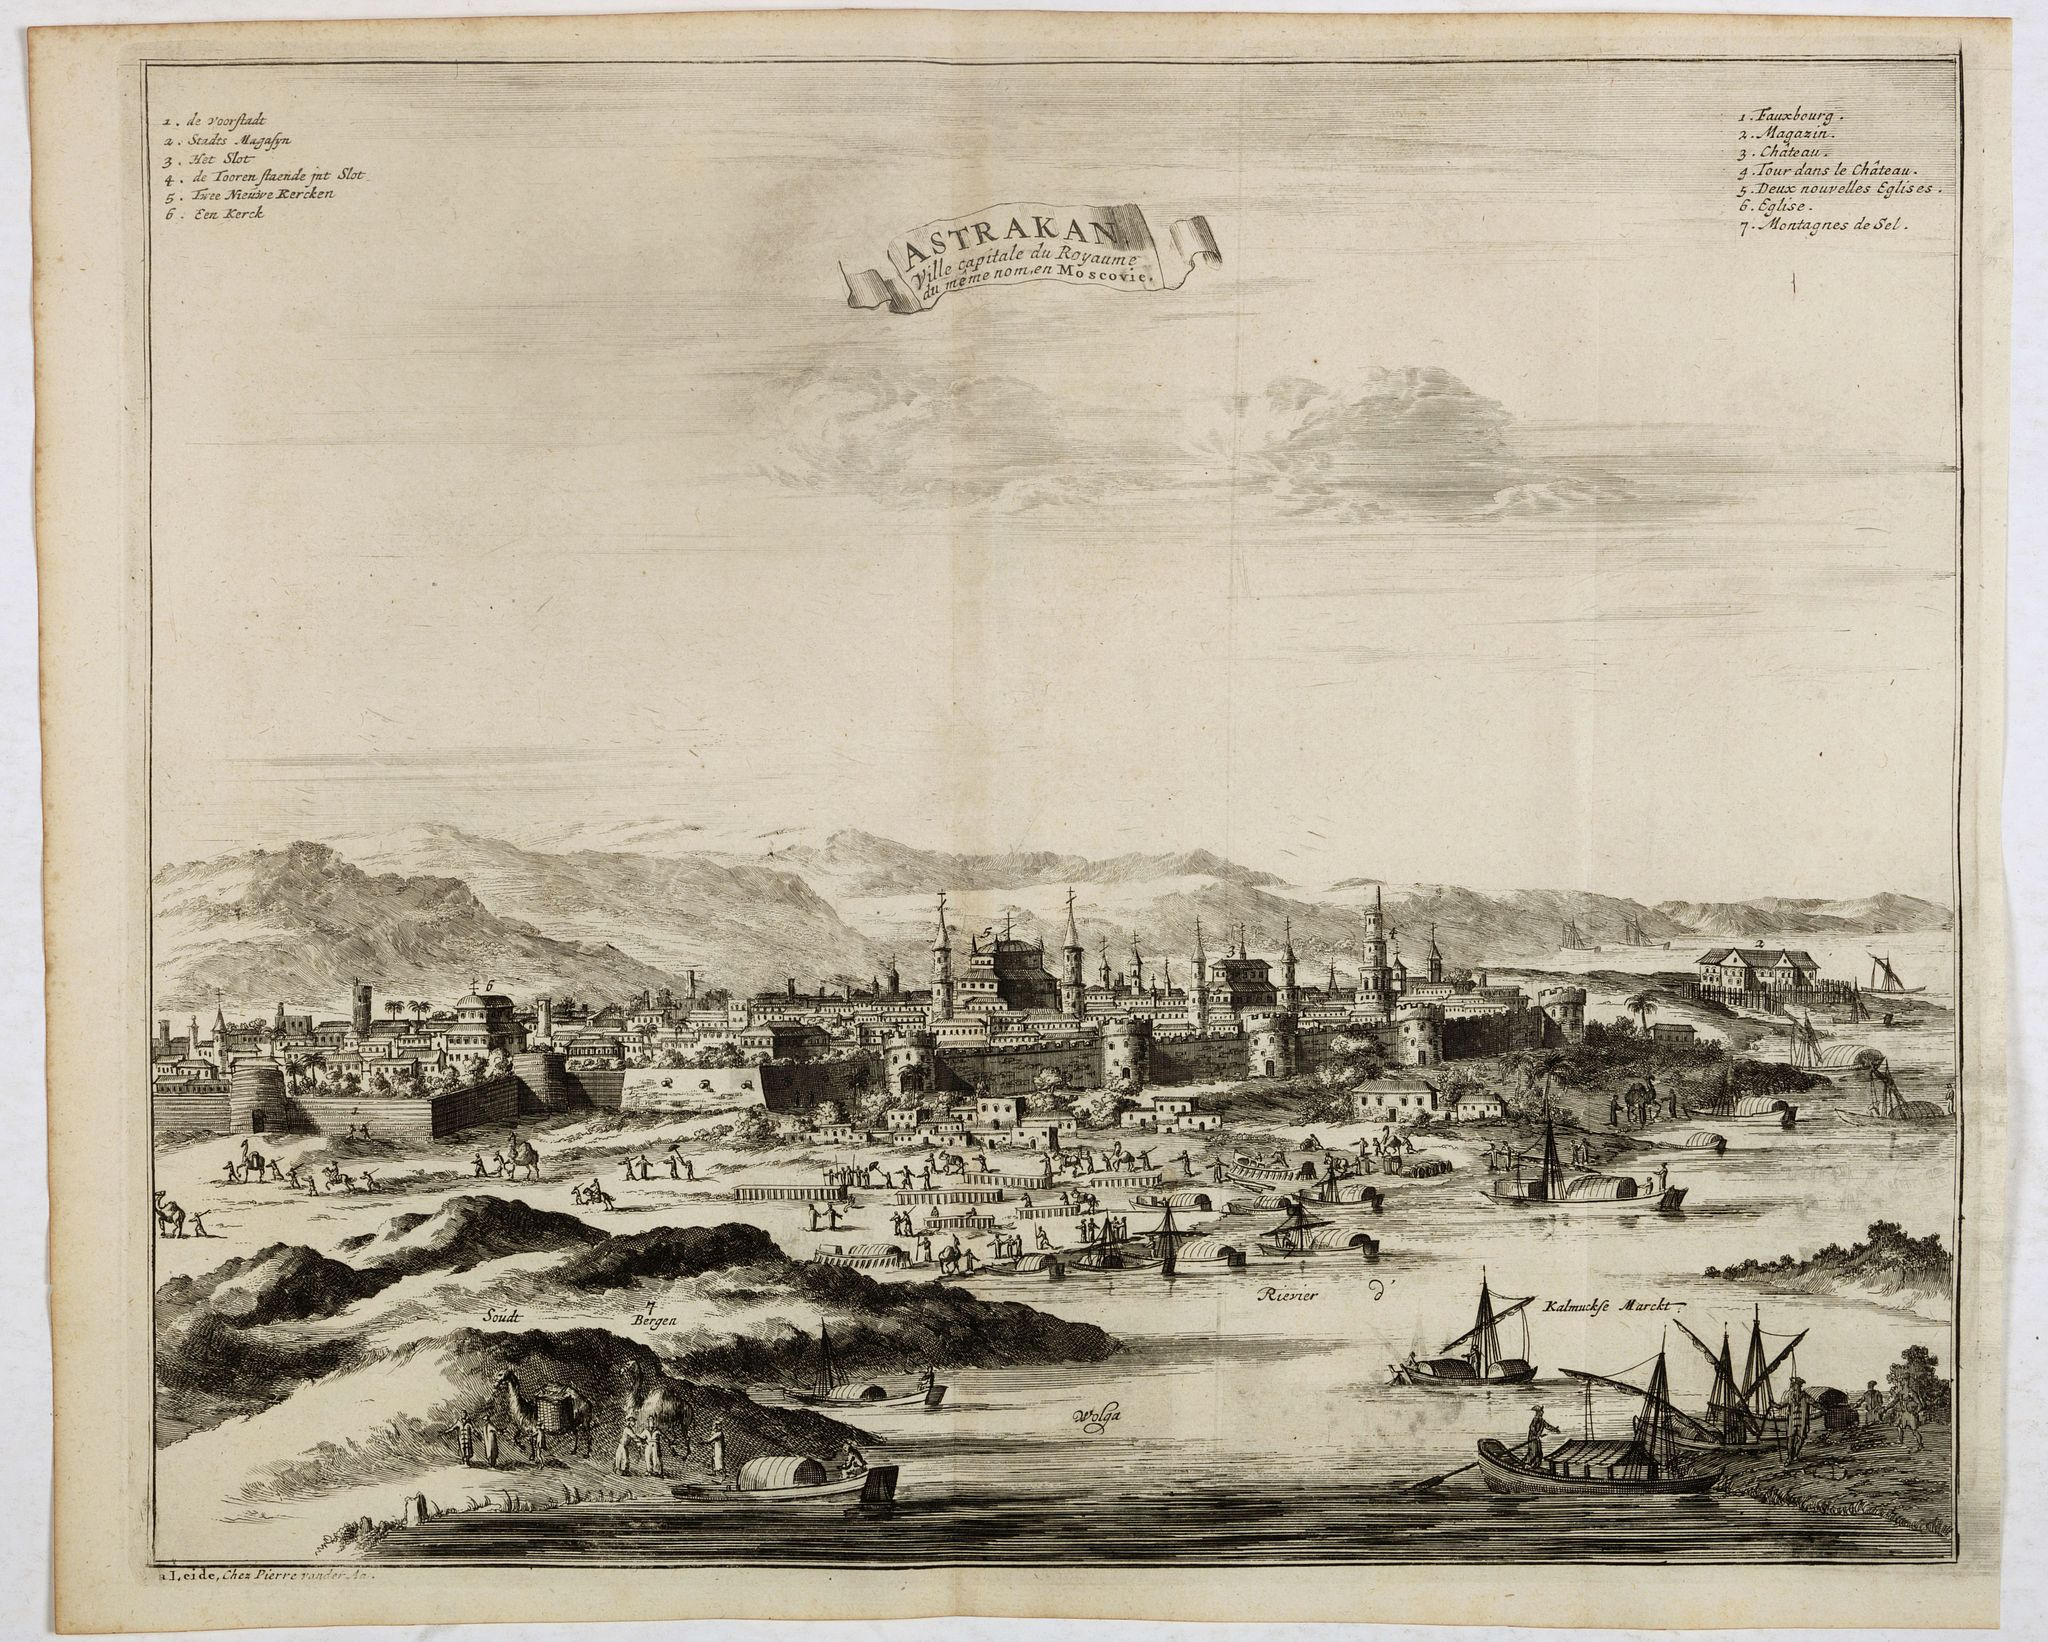 VAN DER AA, P. / OLEARIUS, A. -  Astrakan, ville capitale du royaume du meme nom, en Moscovie. (Astrakhan)